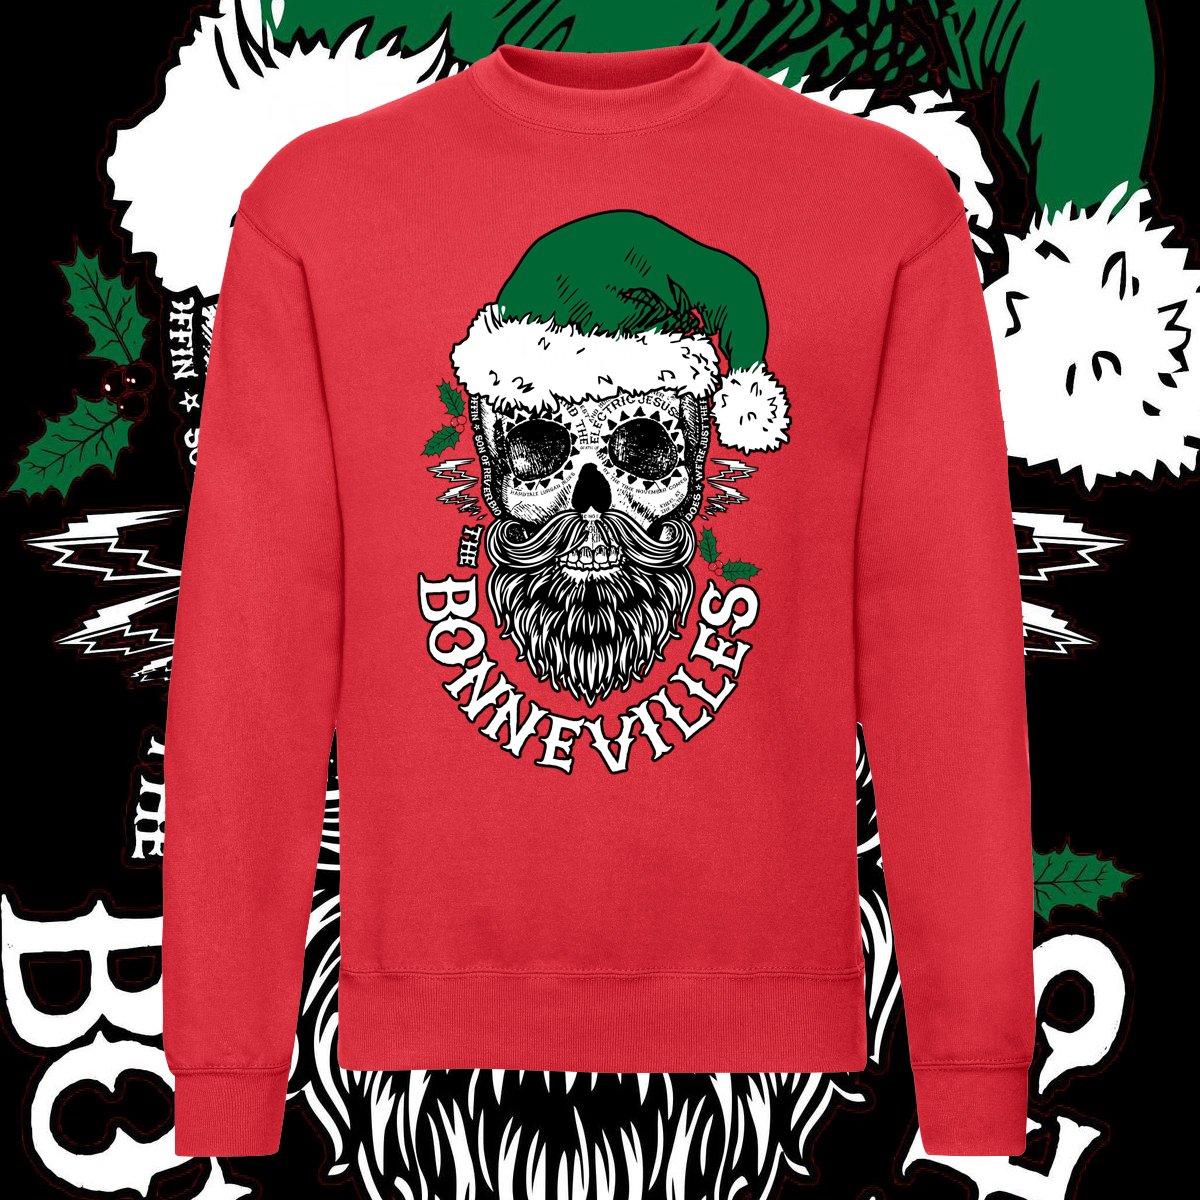 Image of Christmas Sweater